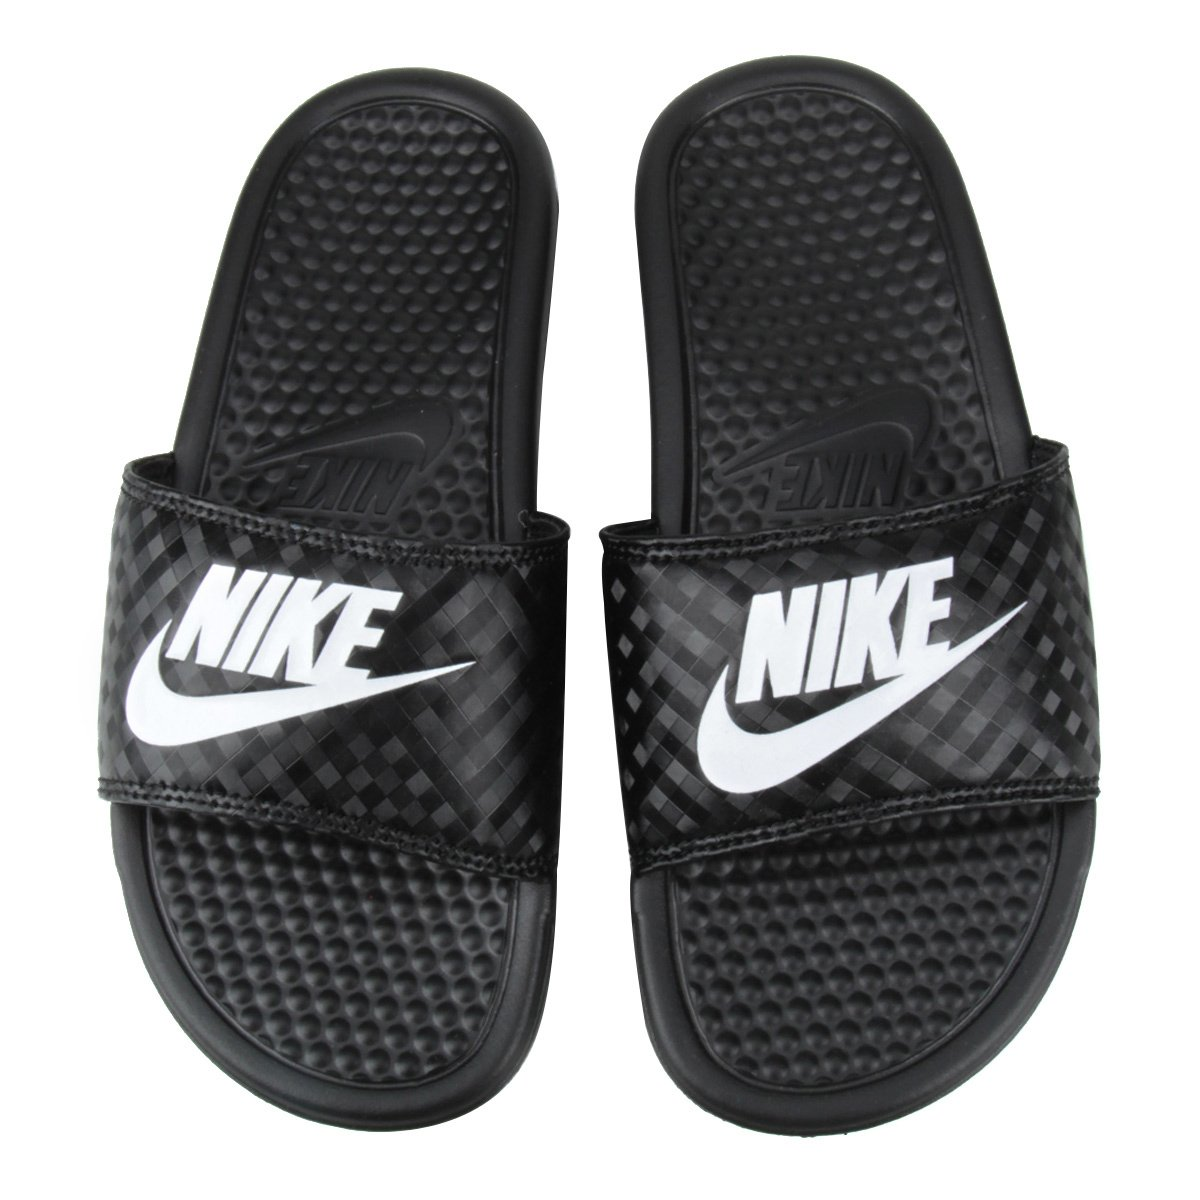 59715dffc7f Chinelo Nike Benassi JDI Slide Feminina - Preto e Branco - Compre Agora